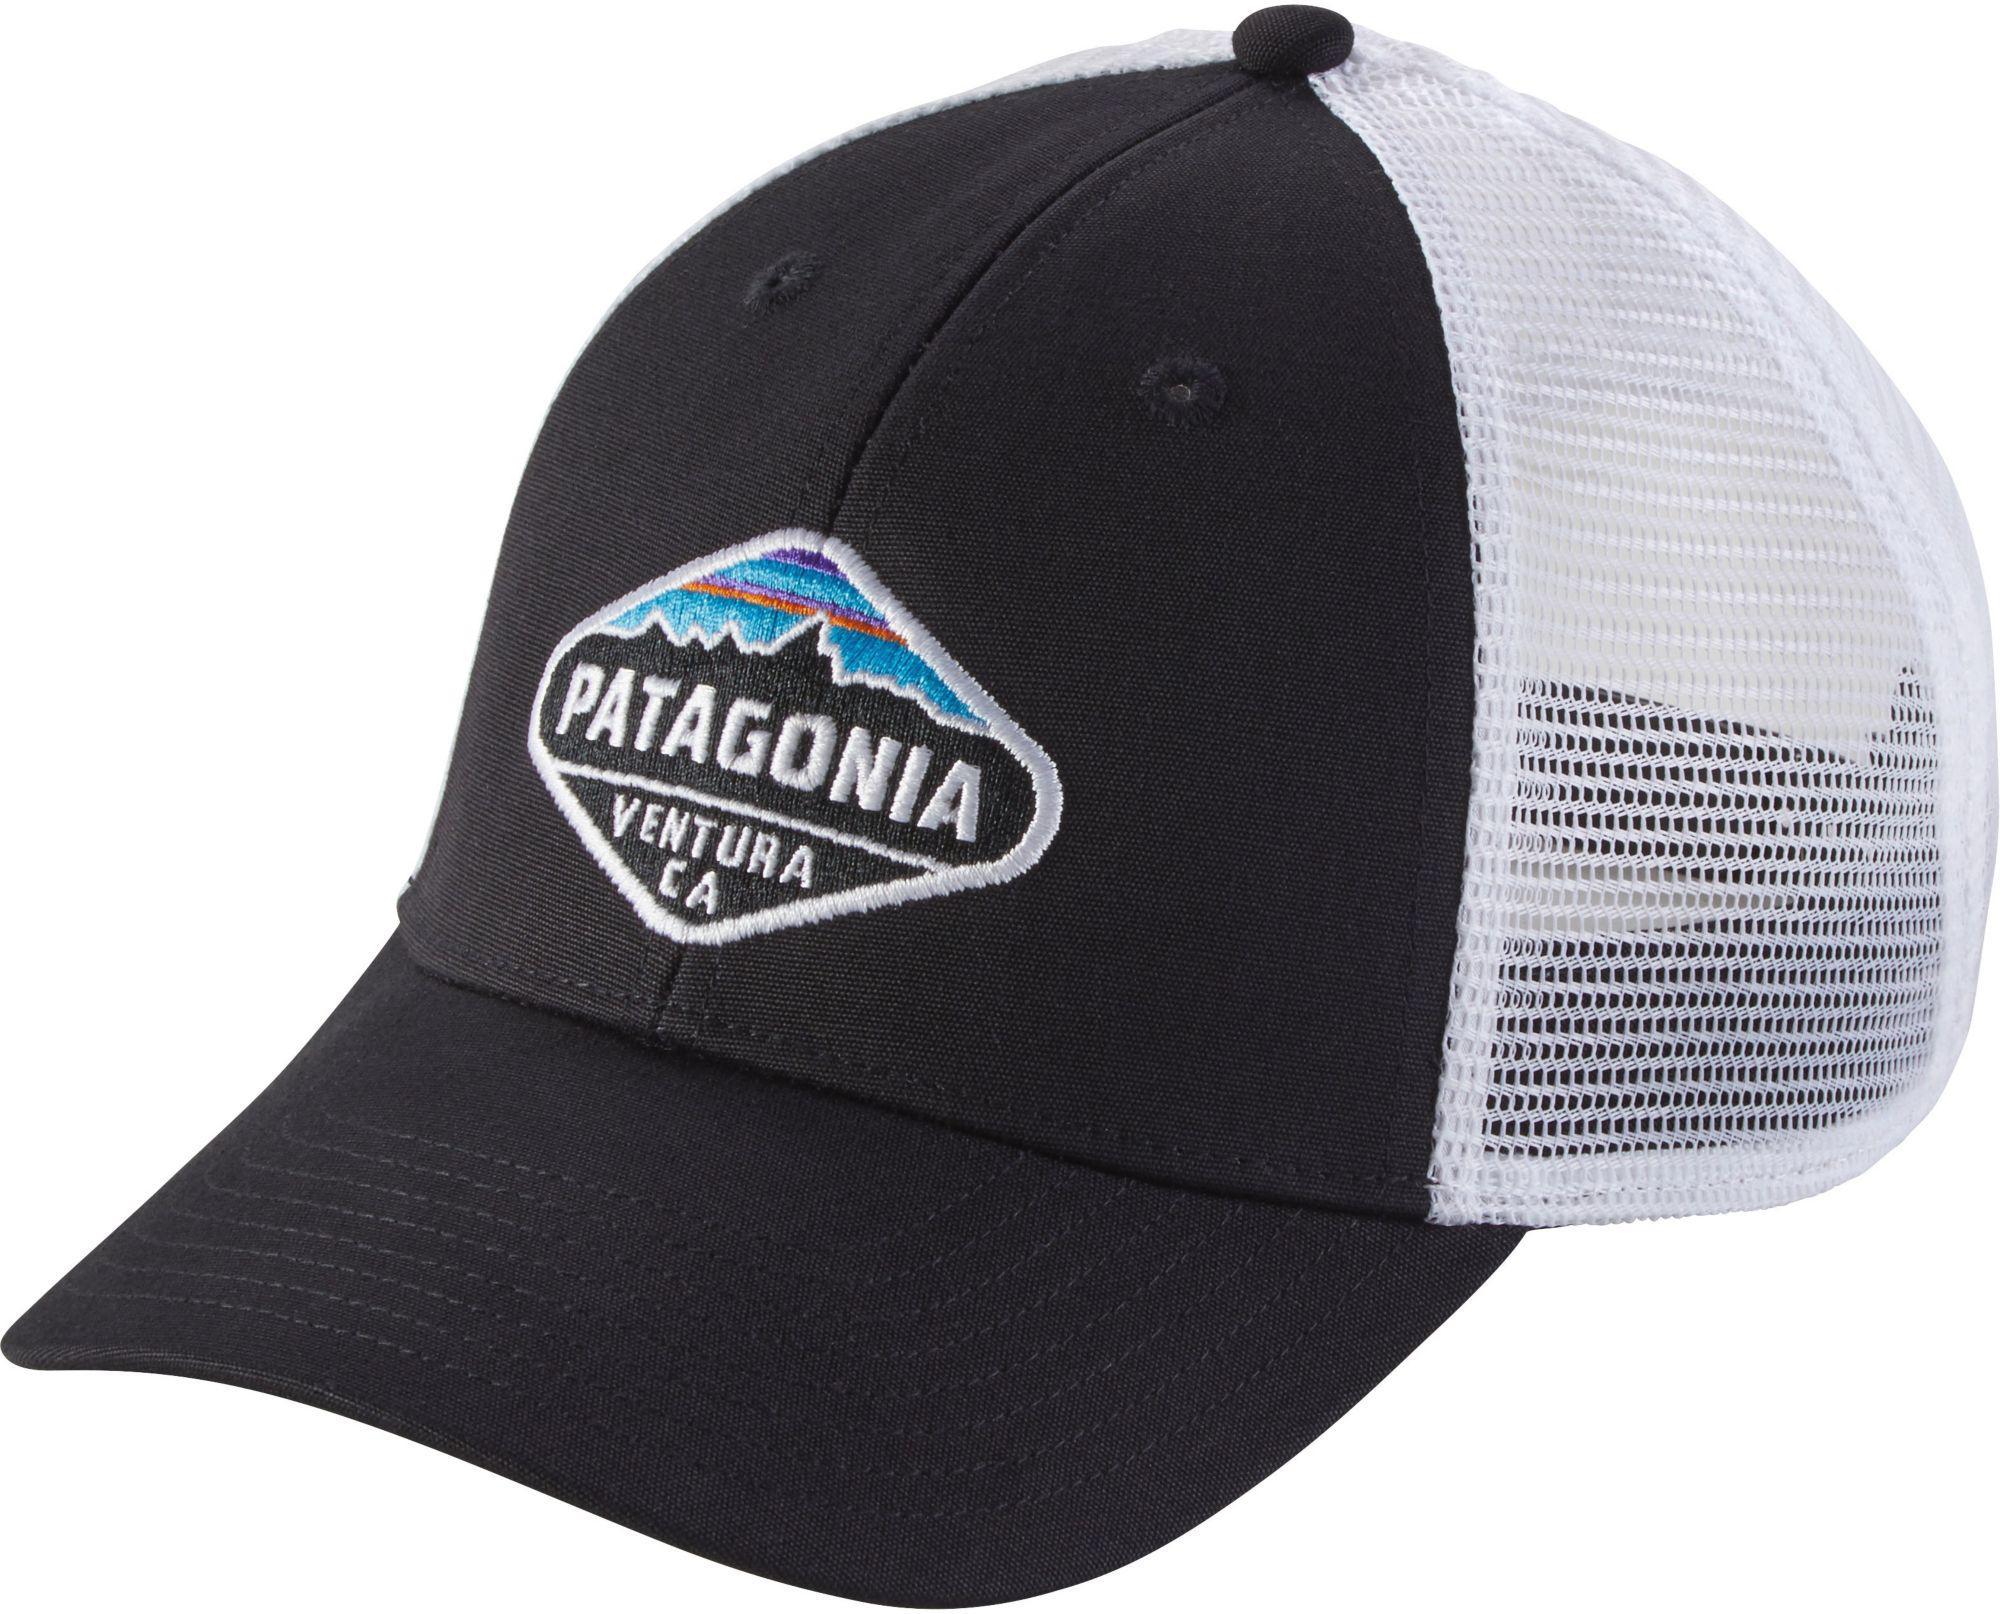 4b8834248dd Lyst - Patagonia Fitz Roy Crest Lopro Trucker Hat in Black for Men